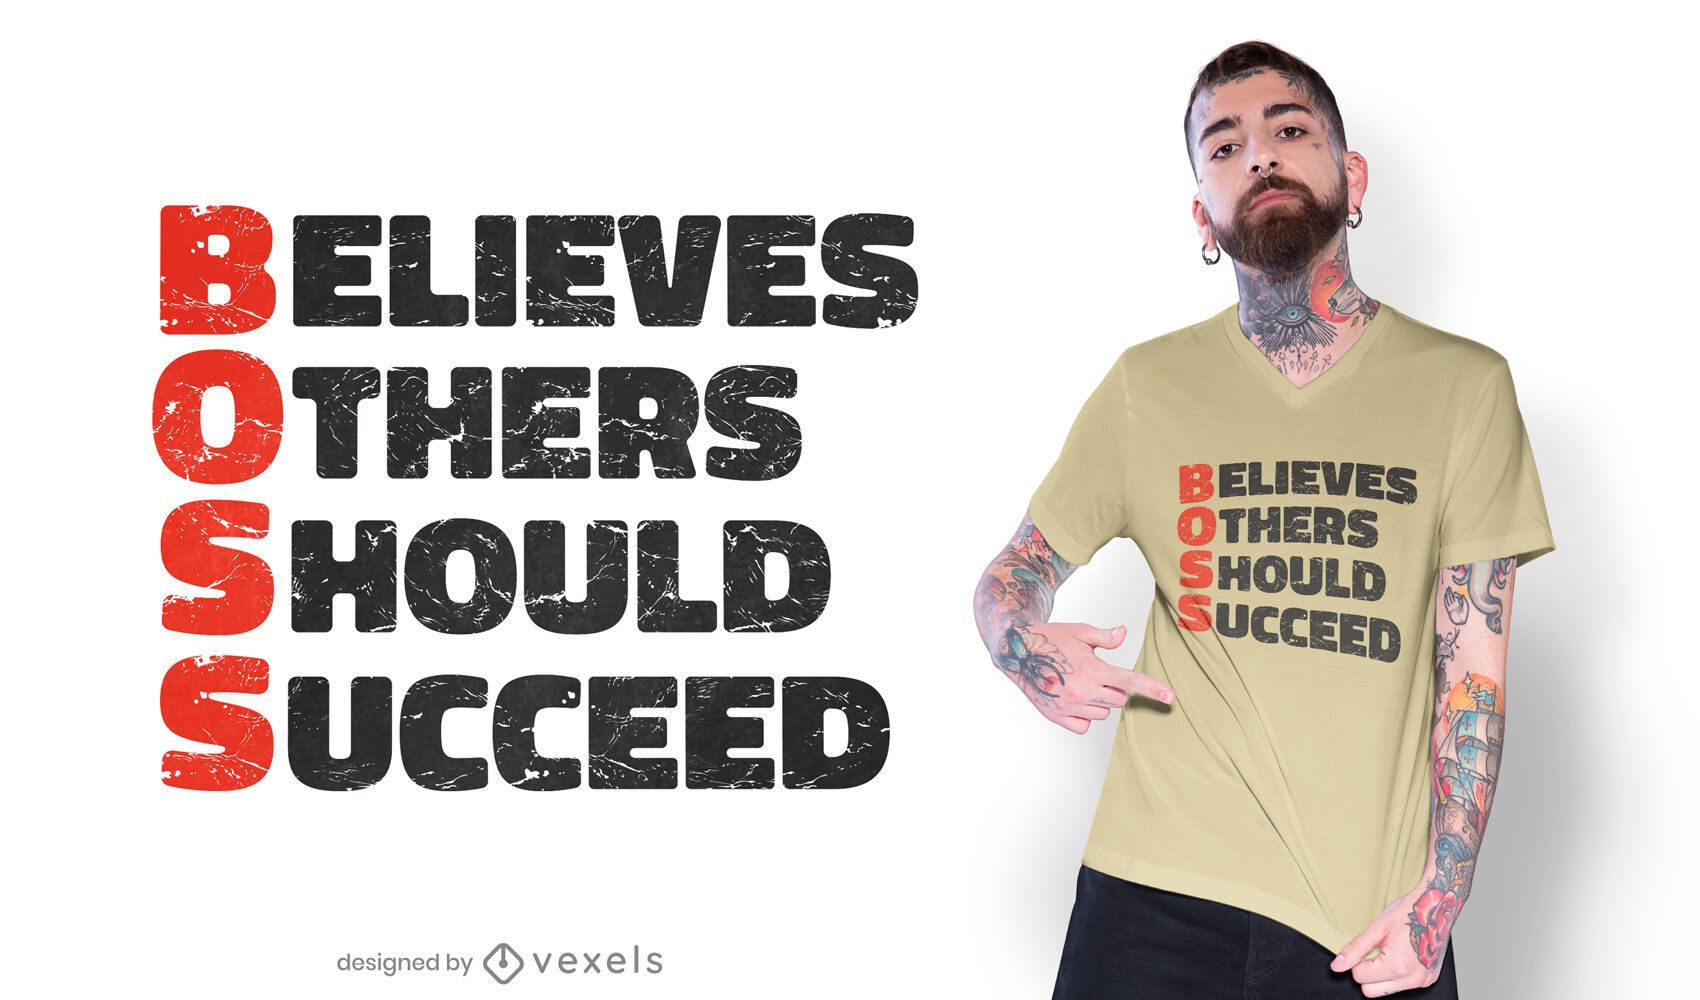 Diseño de camiseta motivacional de iniciales de jefe.